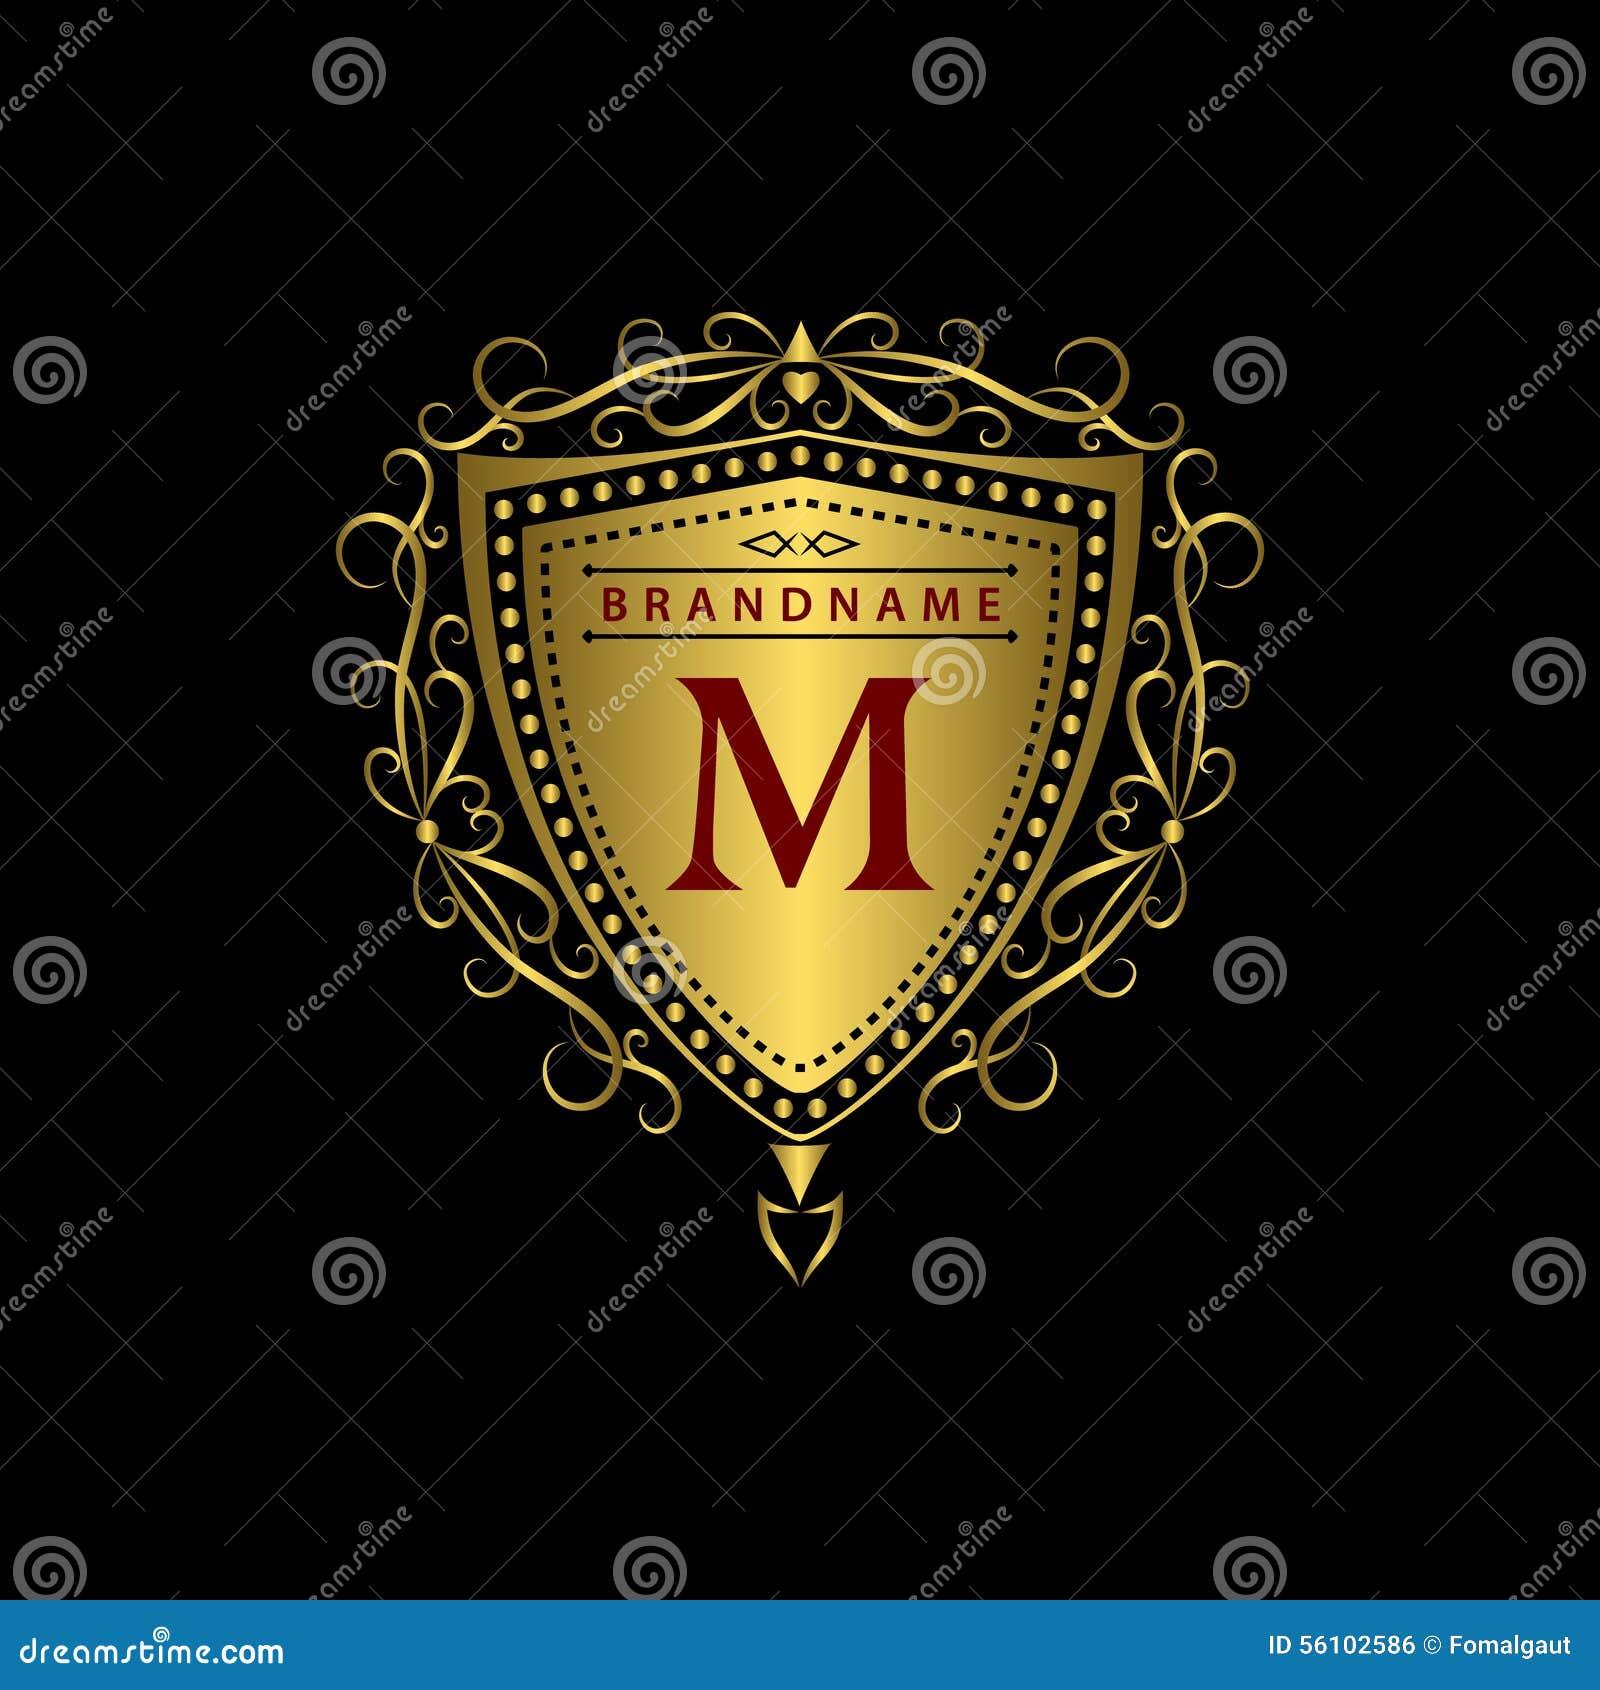 ... template. Calligraphic elegant line art logo design. Gold letter M